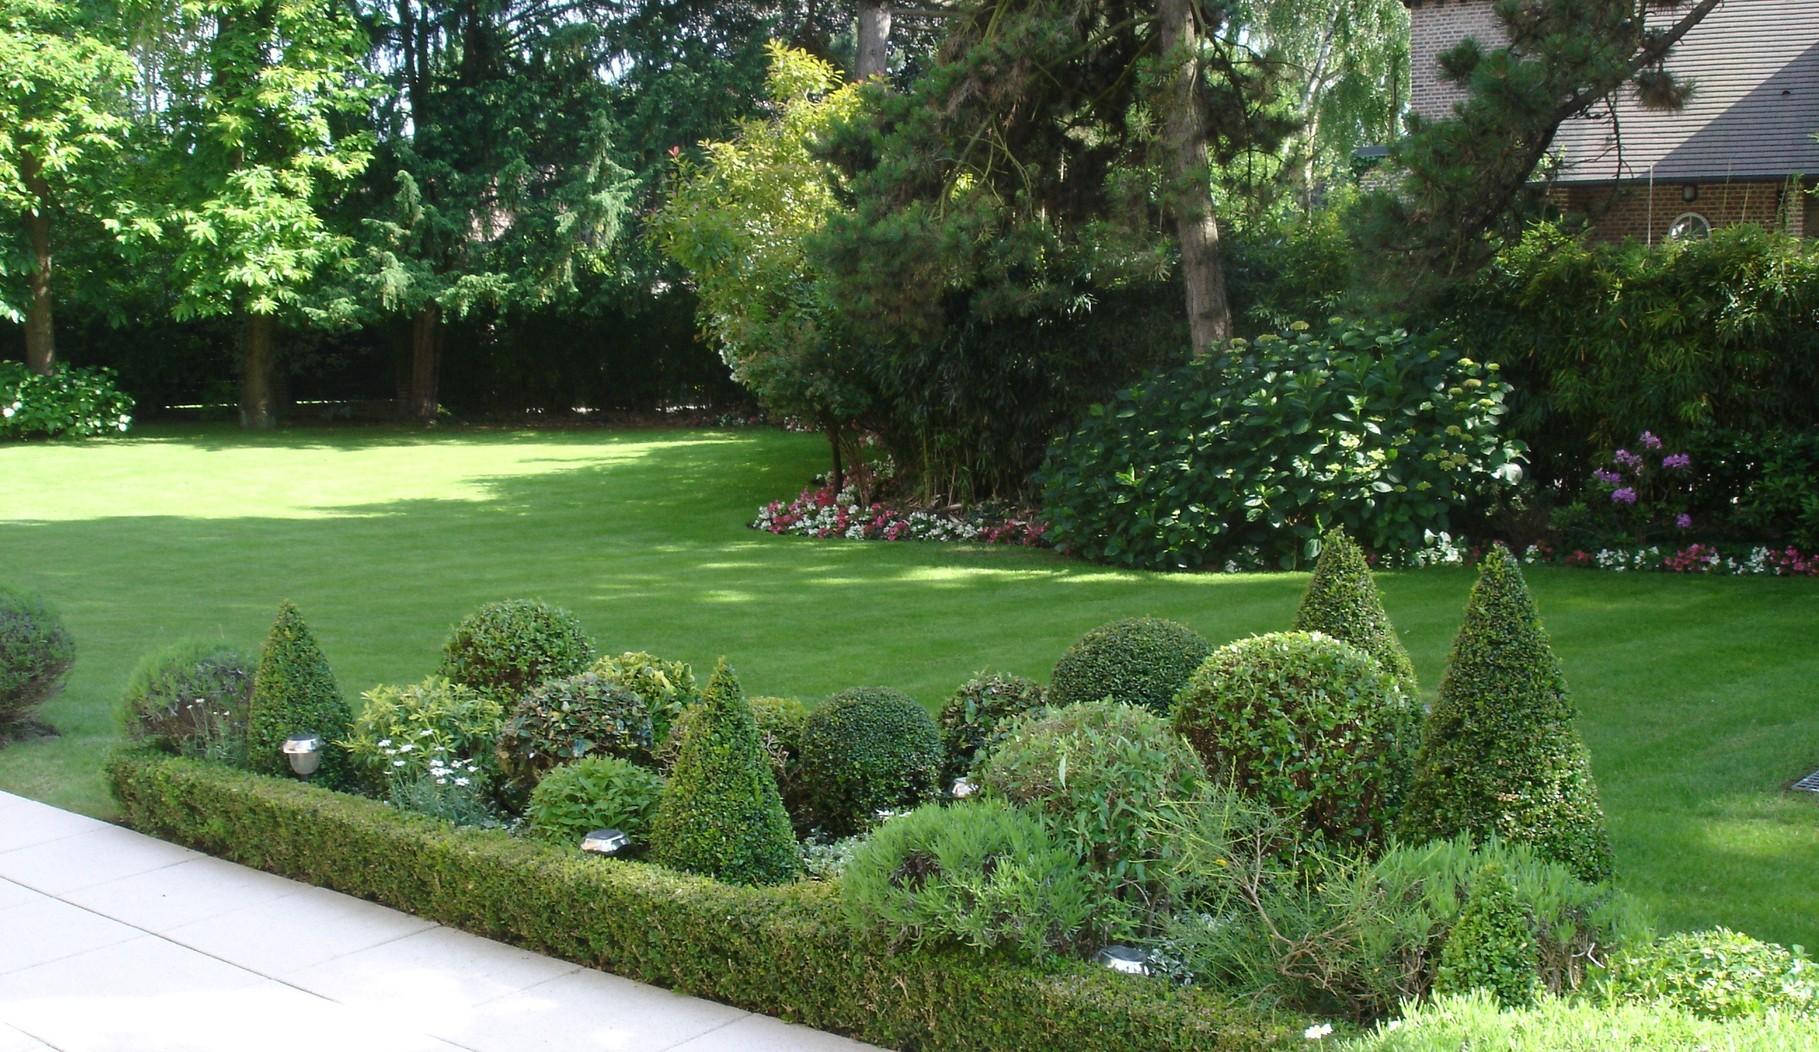 Paysagiste jardi proxi bondues entretien de jardins for Entretien jardin 76